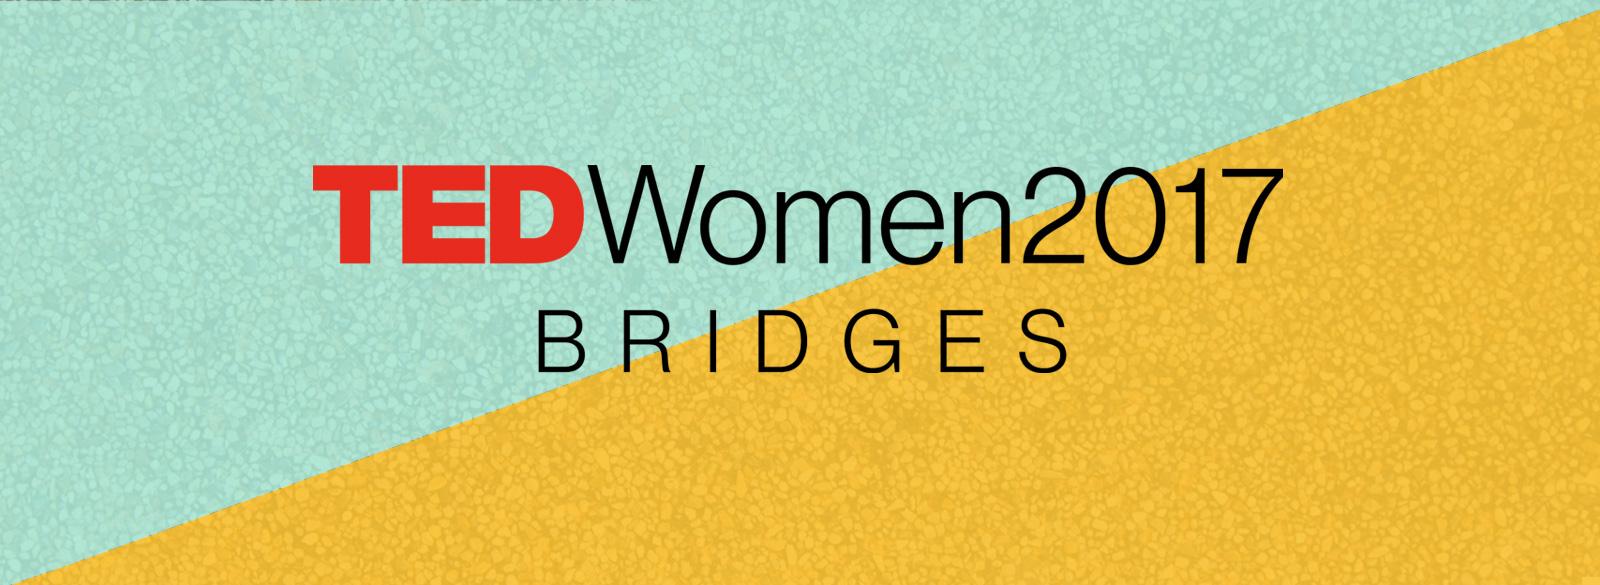 TEDWomen 2017 Webcast - Bridges